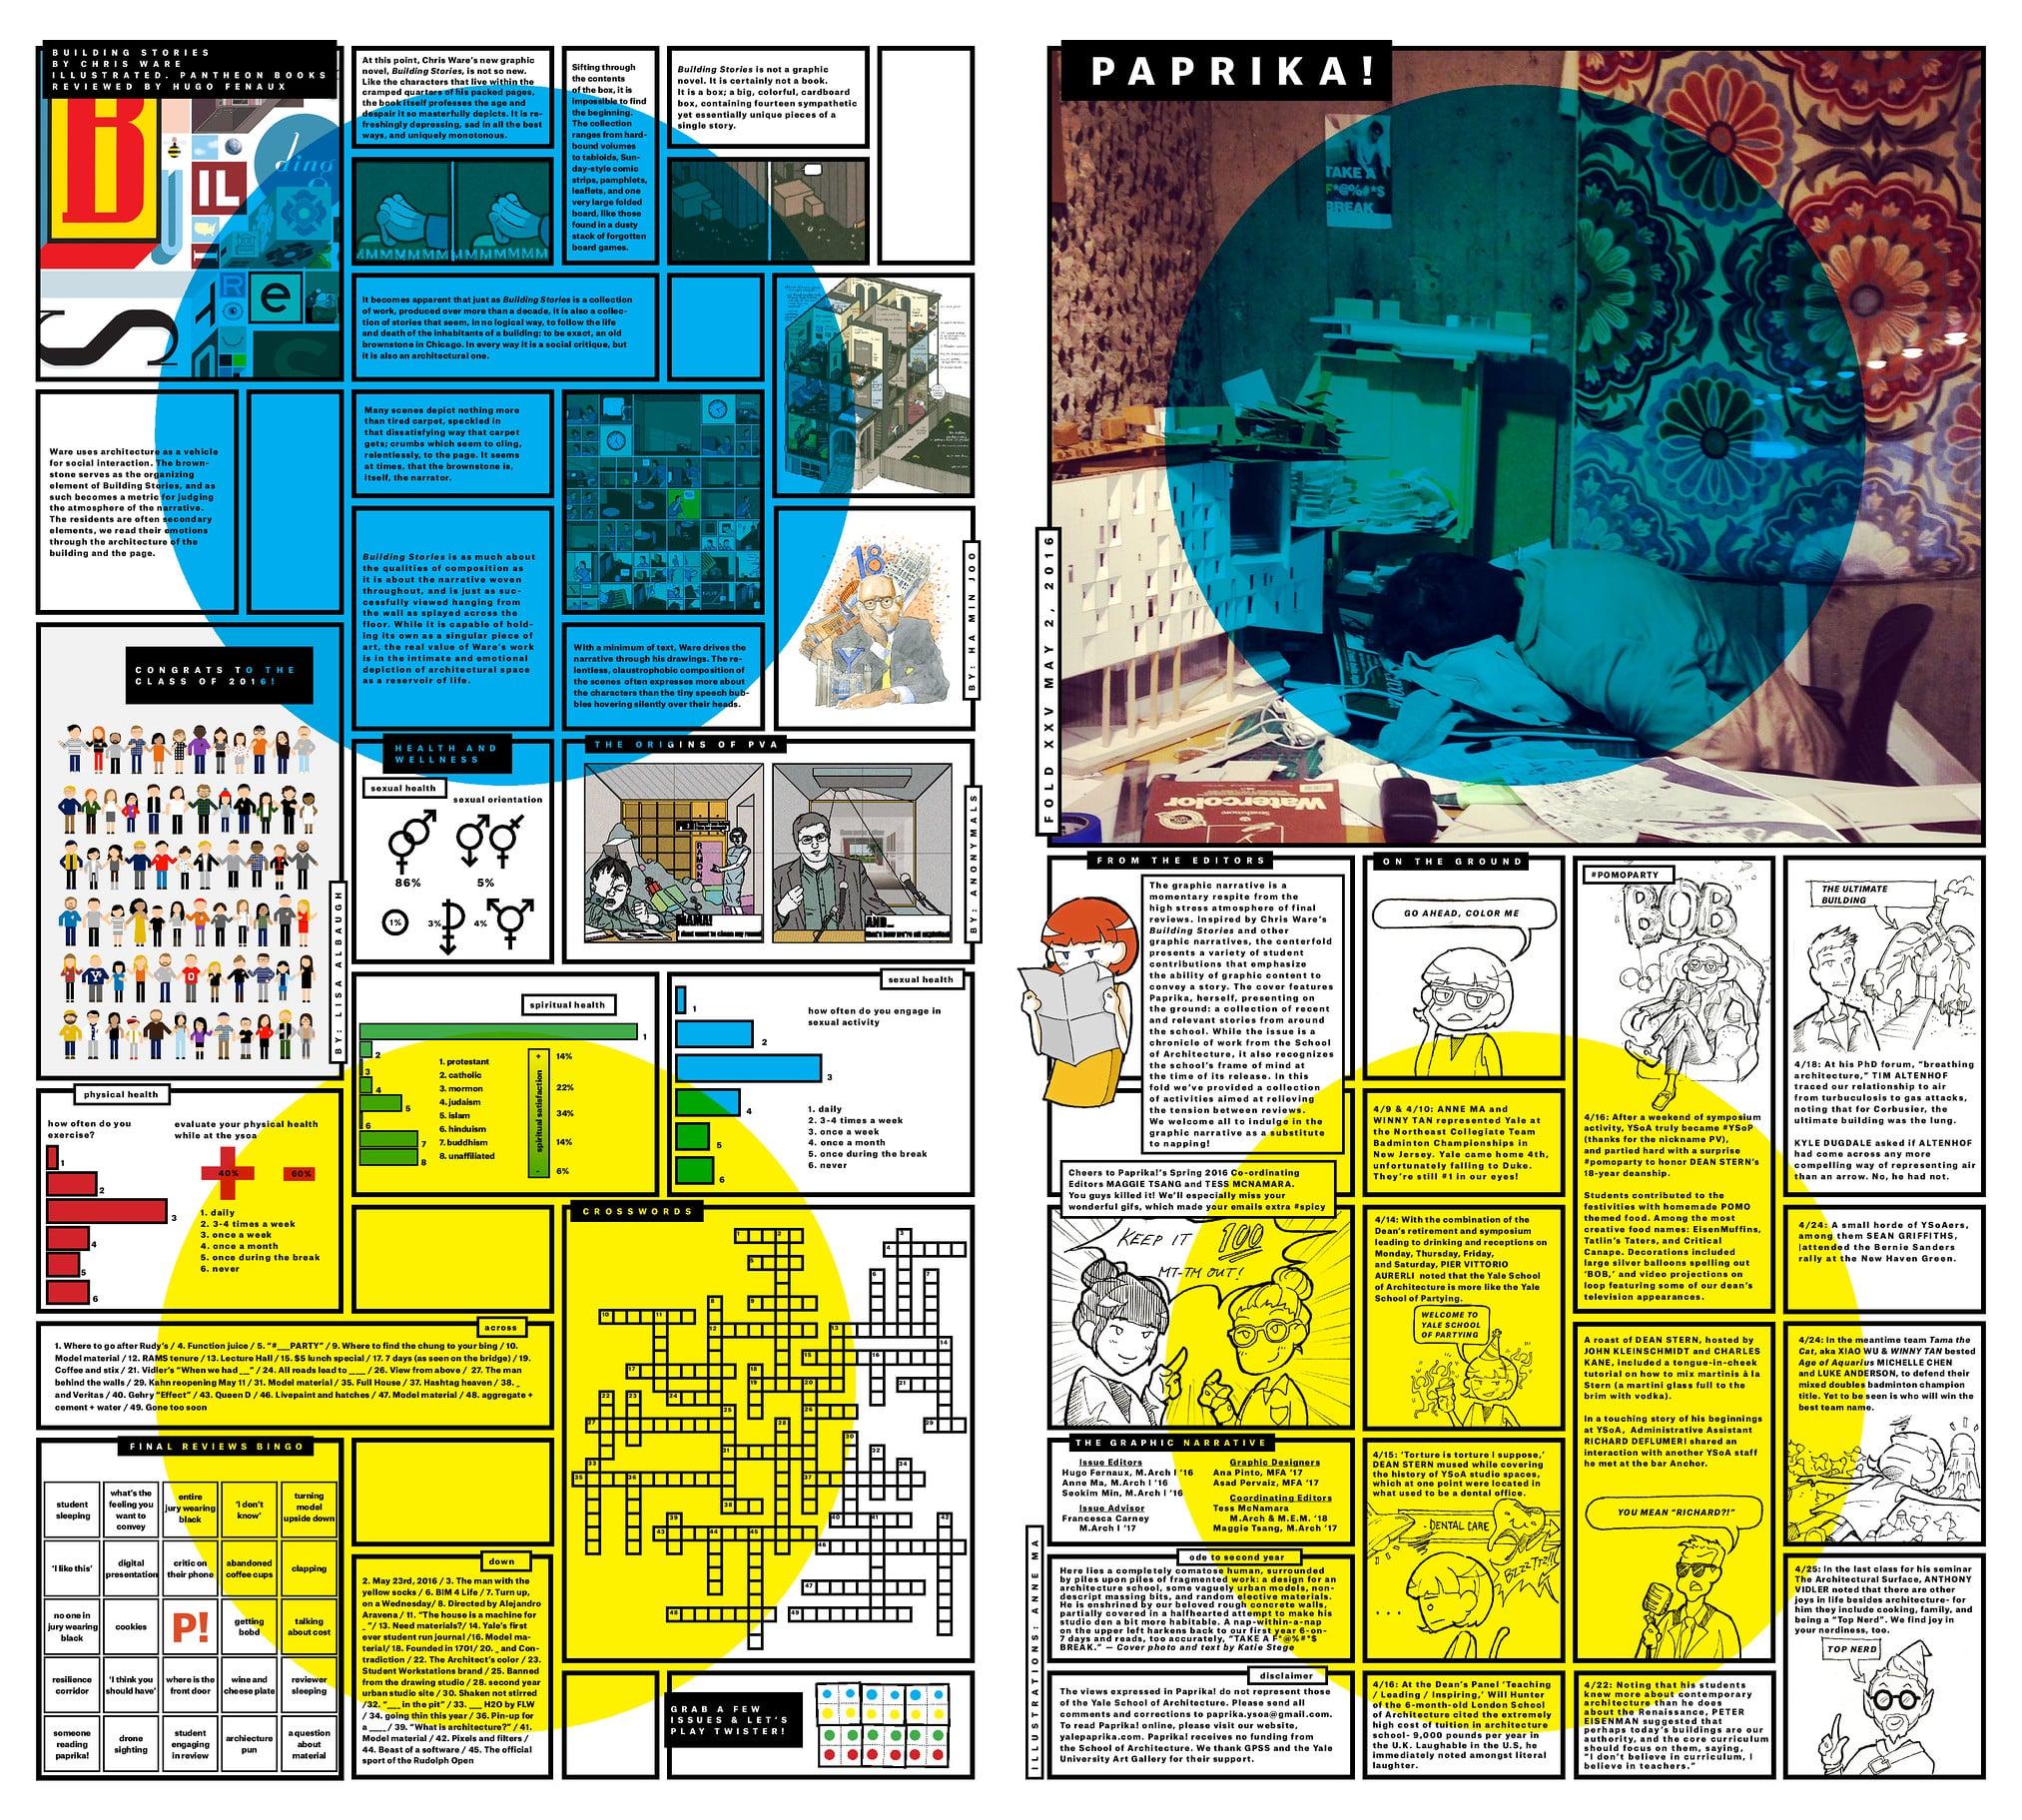 1-25 The Graphic Narrative